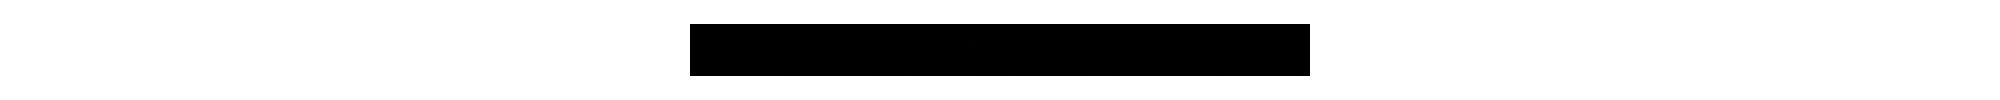 loonee gmbh logo